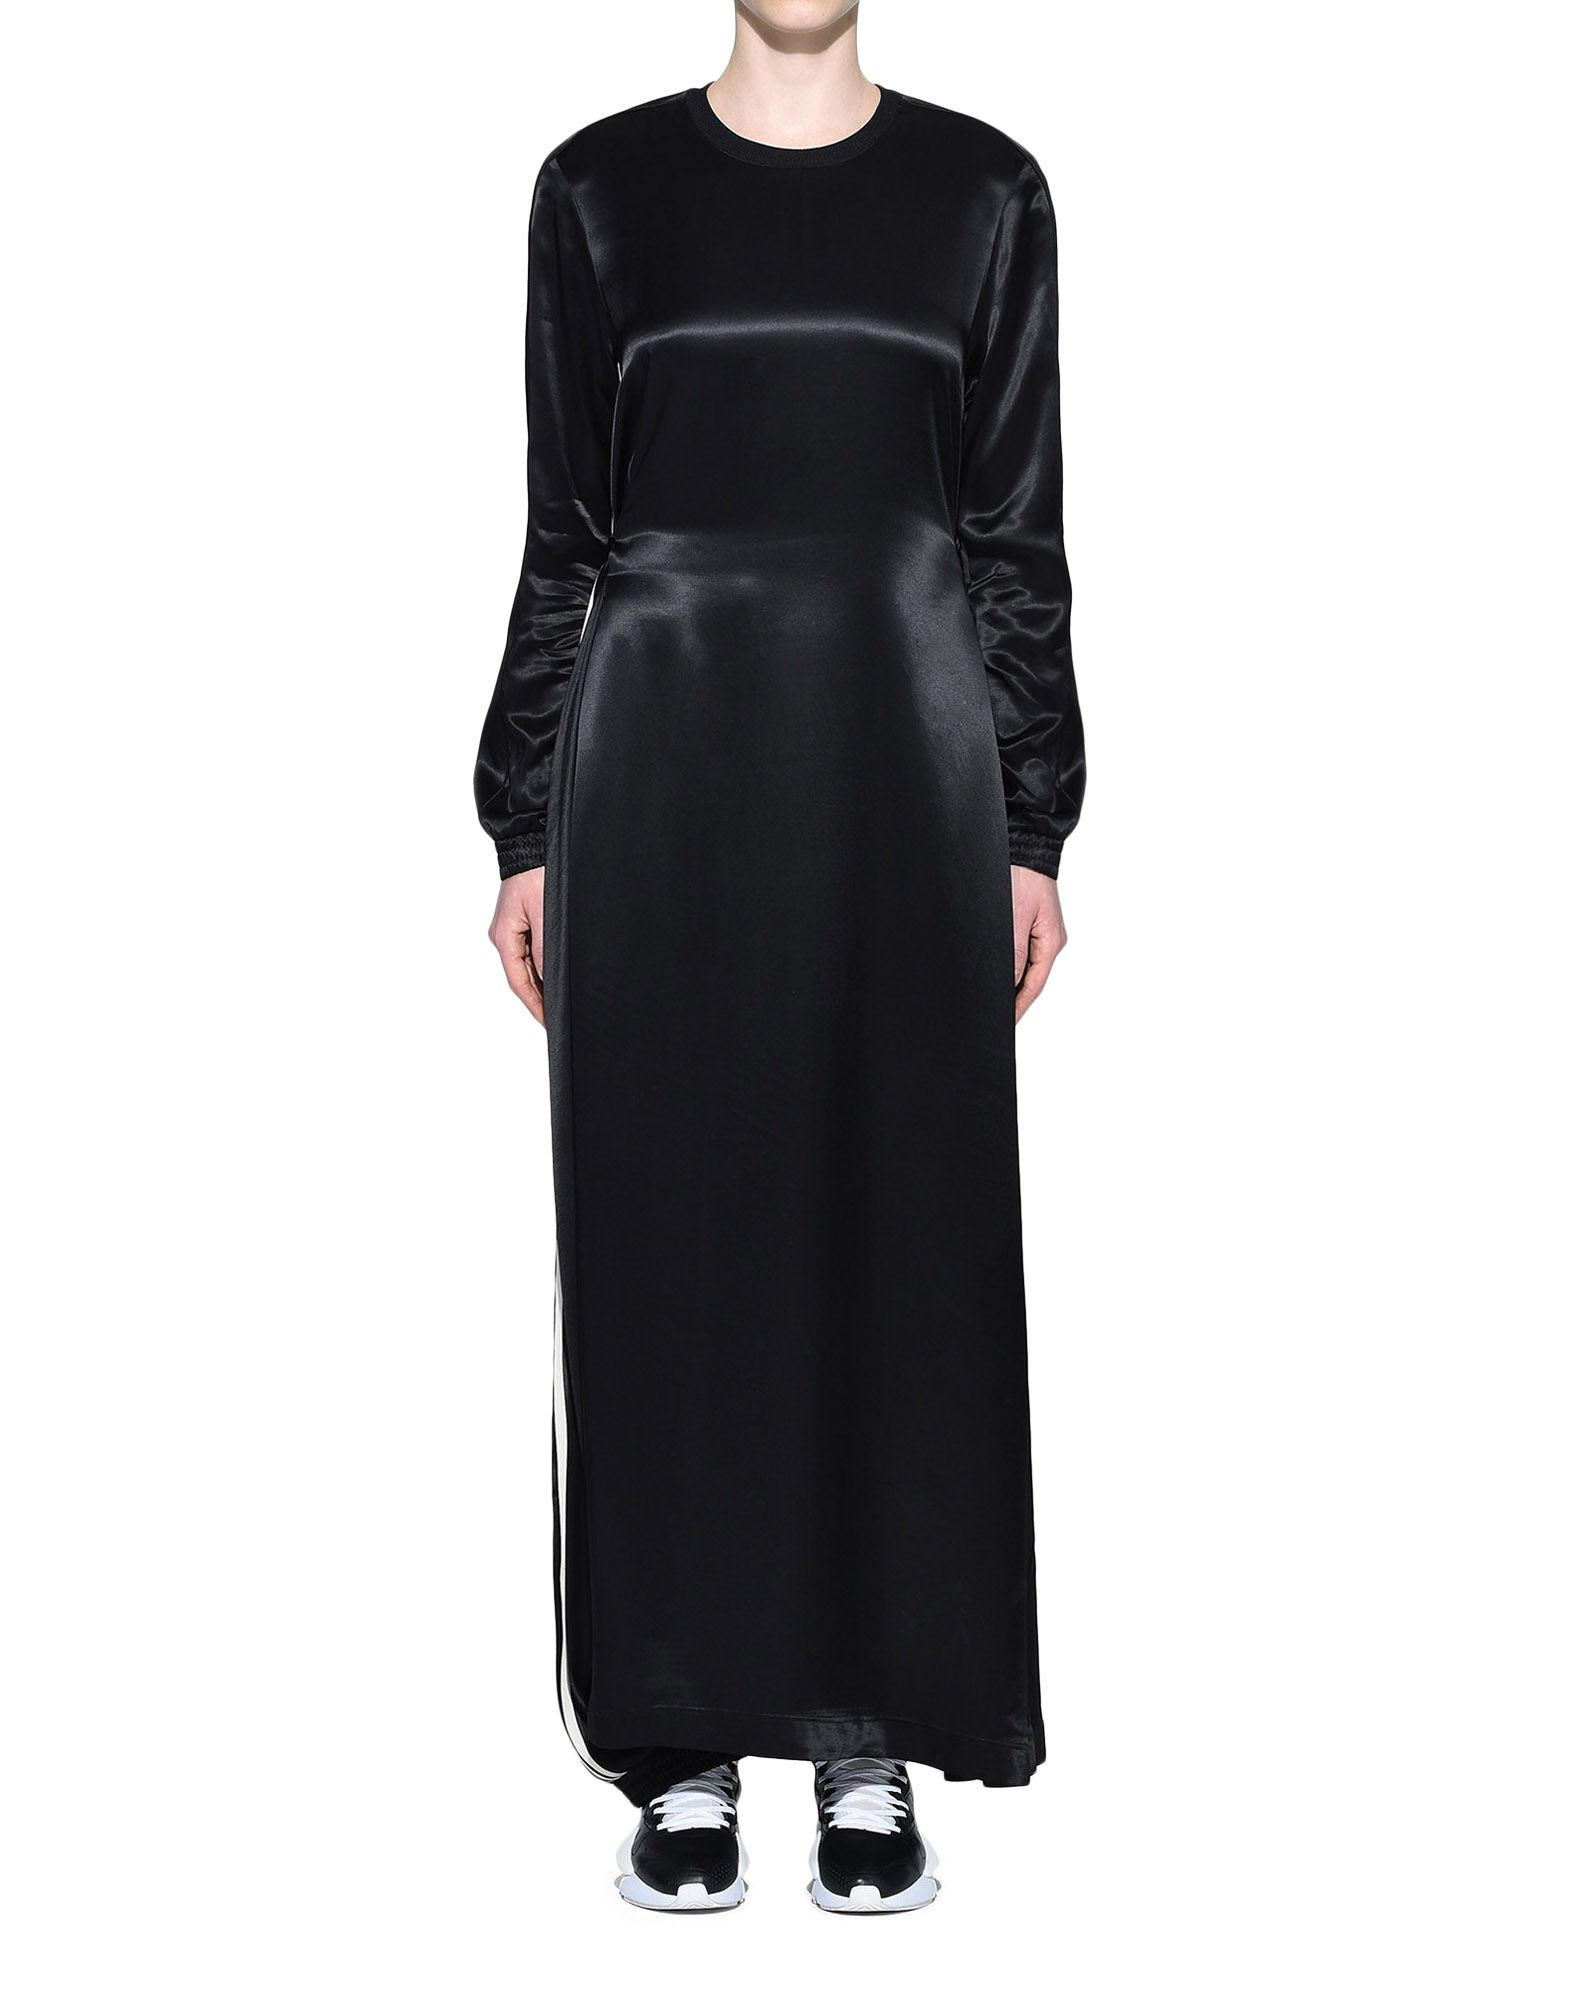 Y-3 Y-3 3-Stripes Lux Track Dress Длинное платье Для Женщин r